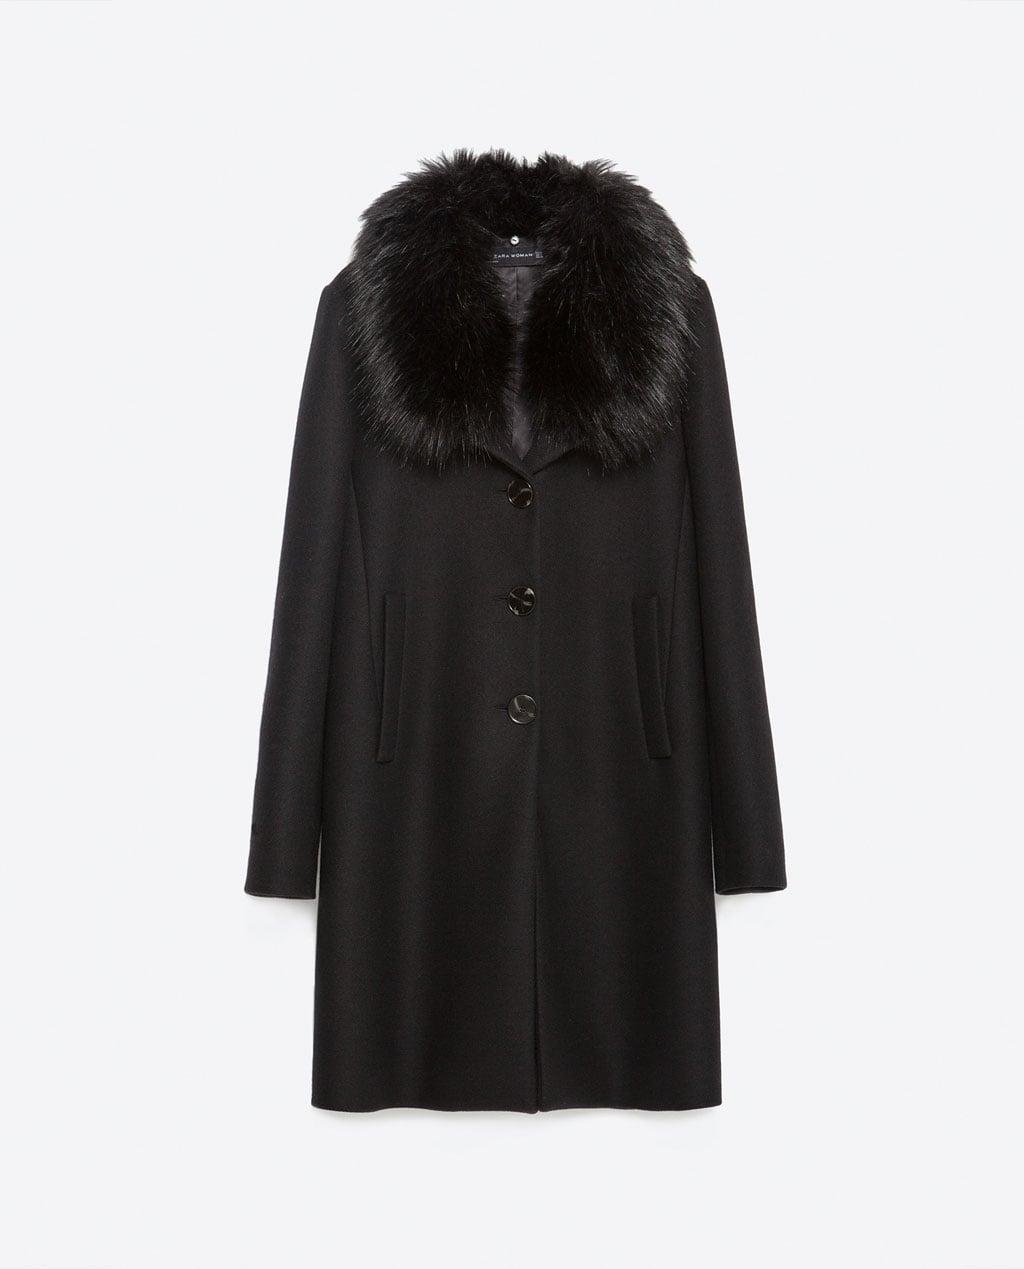 zara coat with faux fur collar, $199